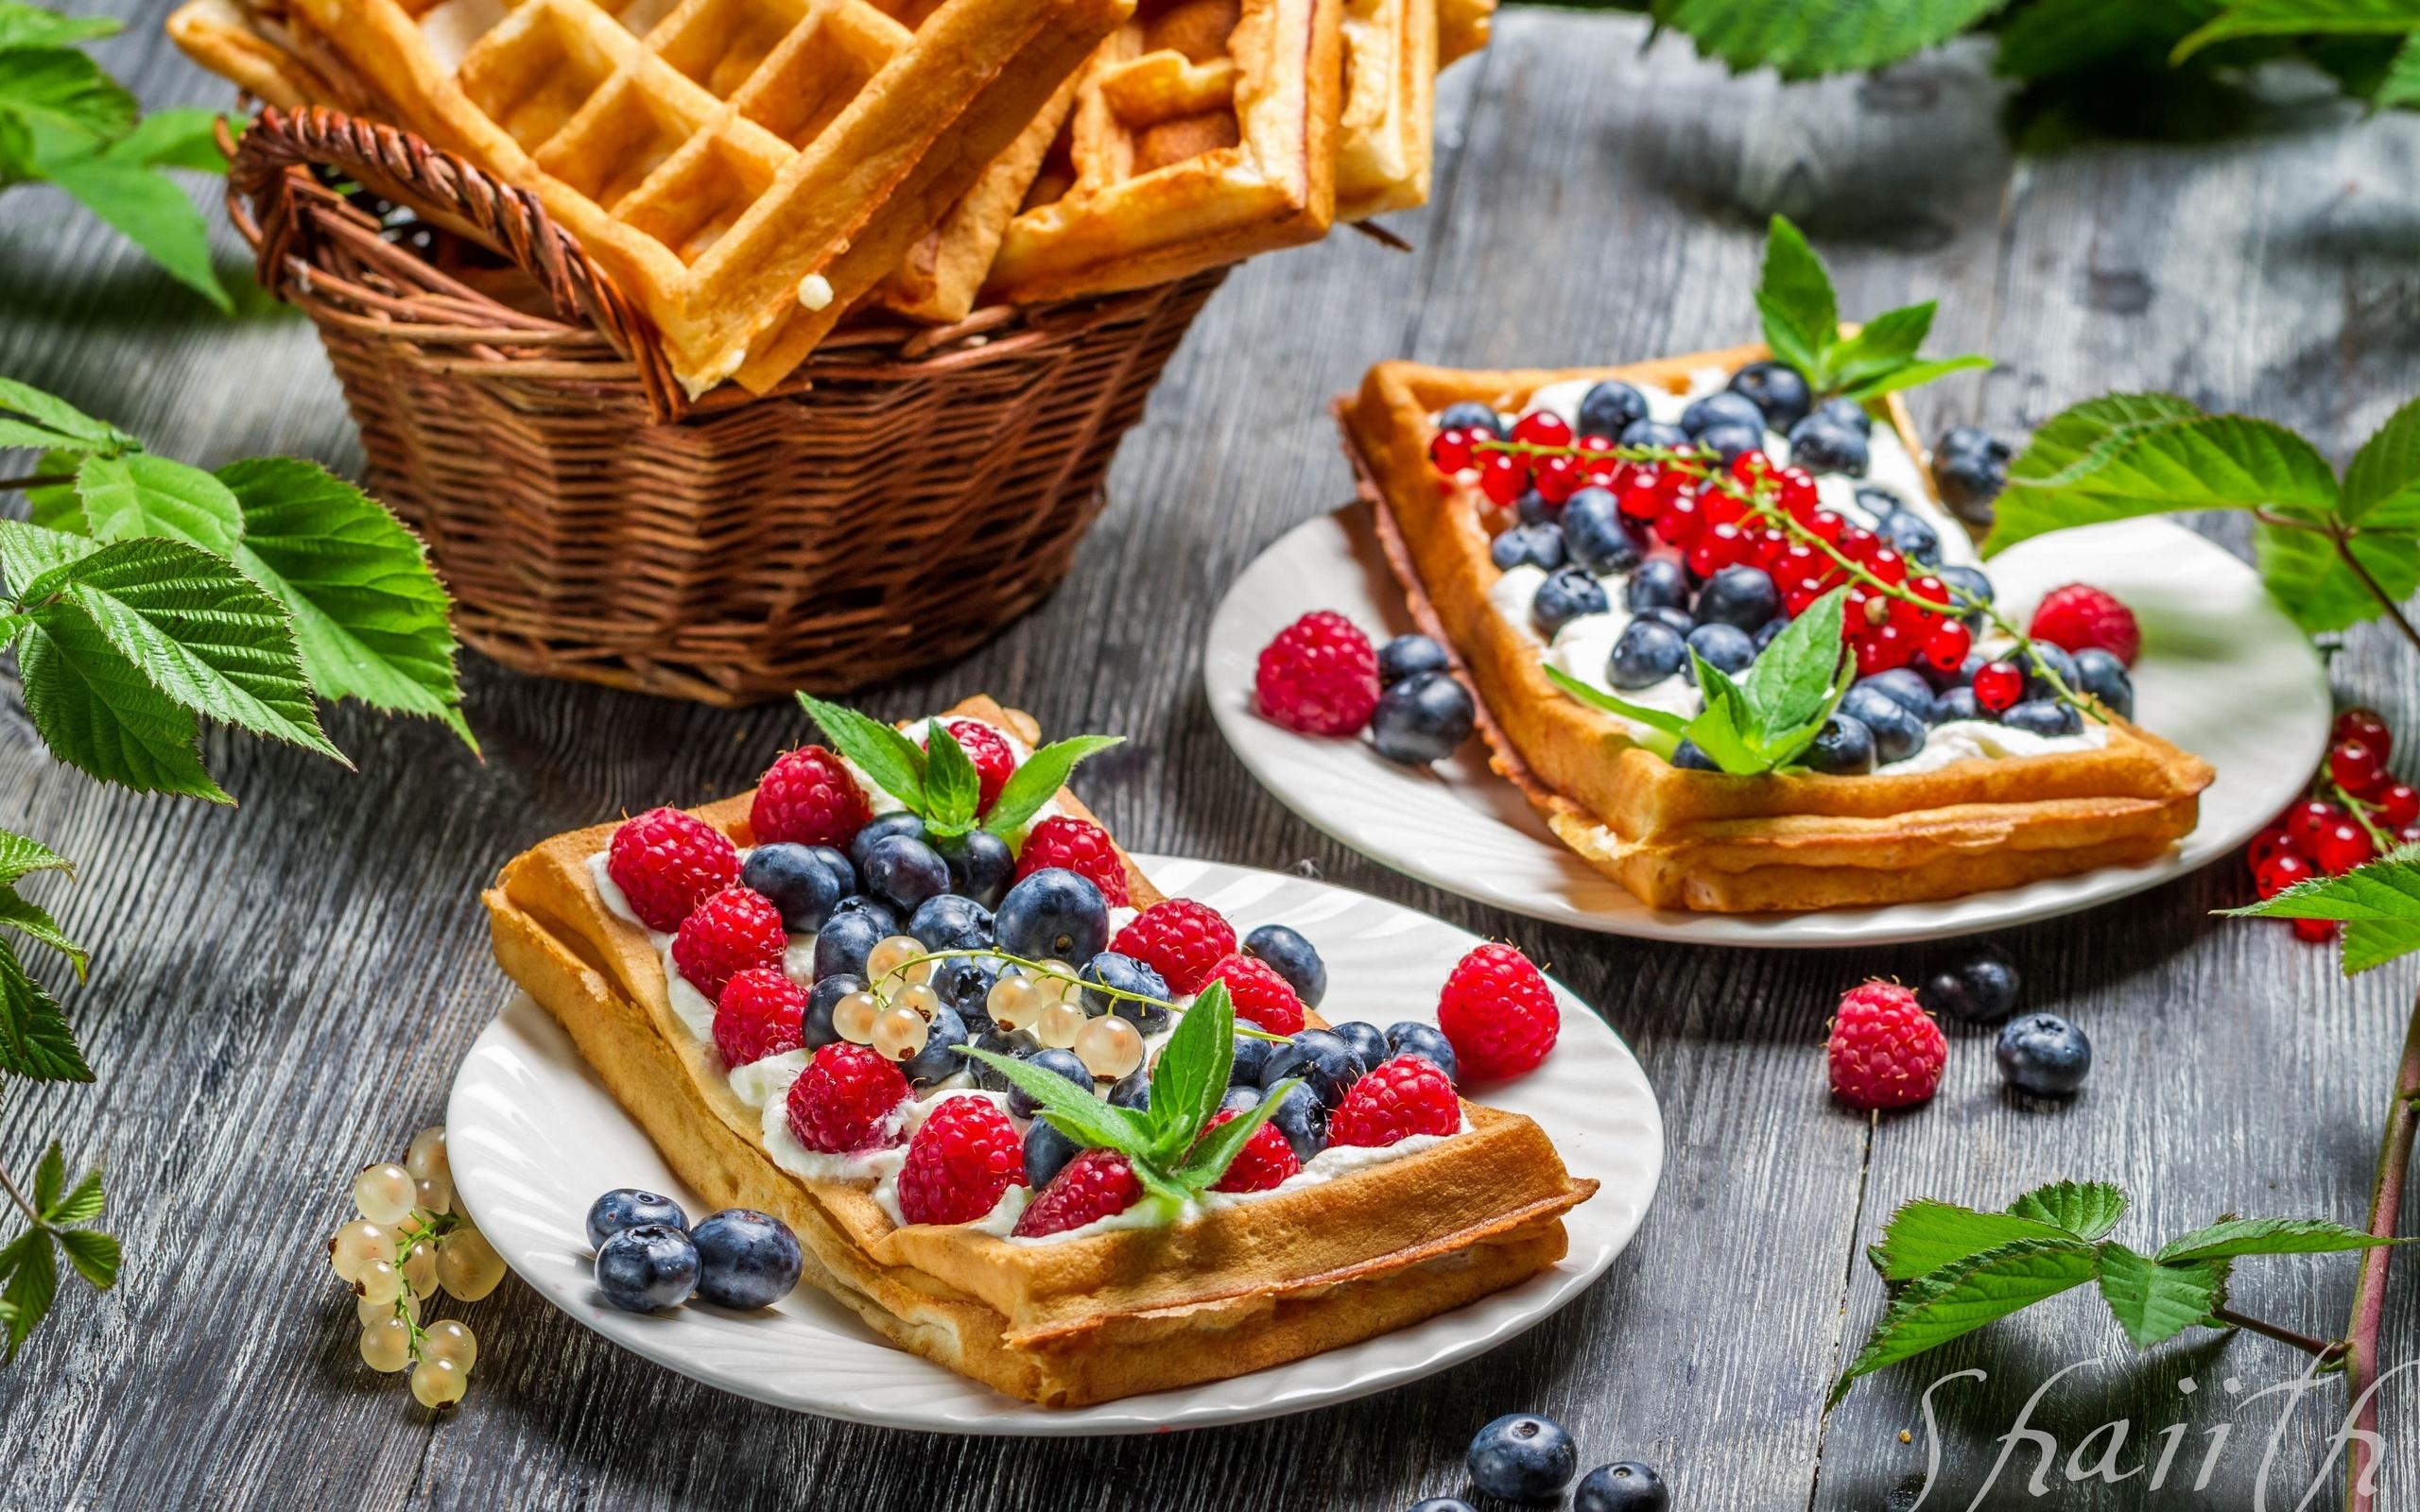 waffles wallpaper 2560x1600 - photo #5